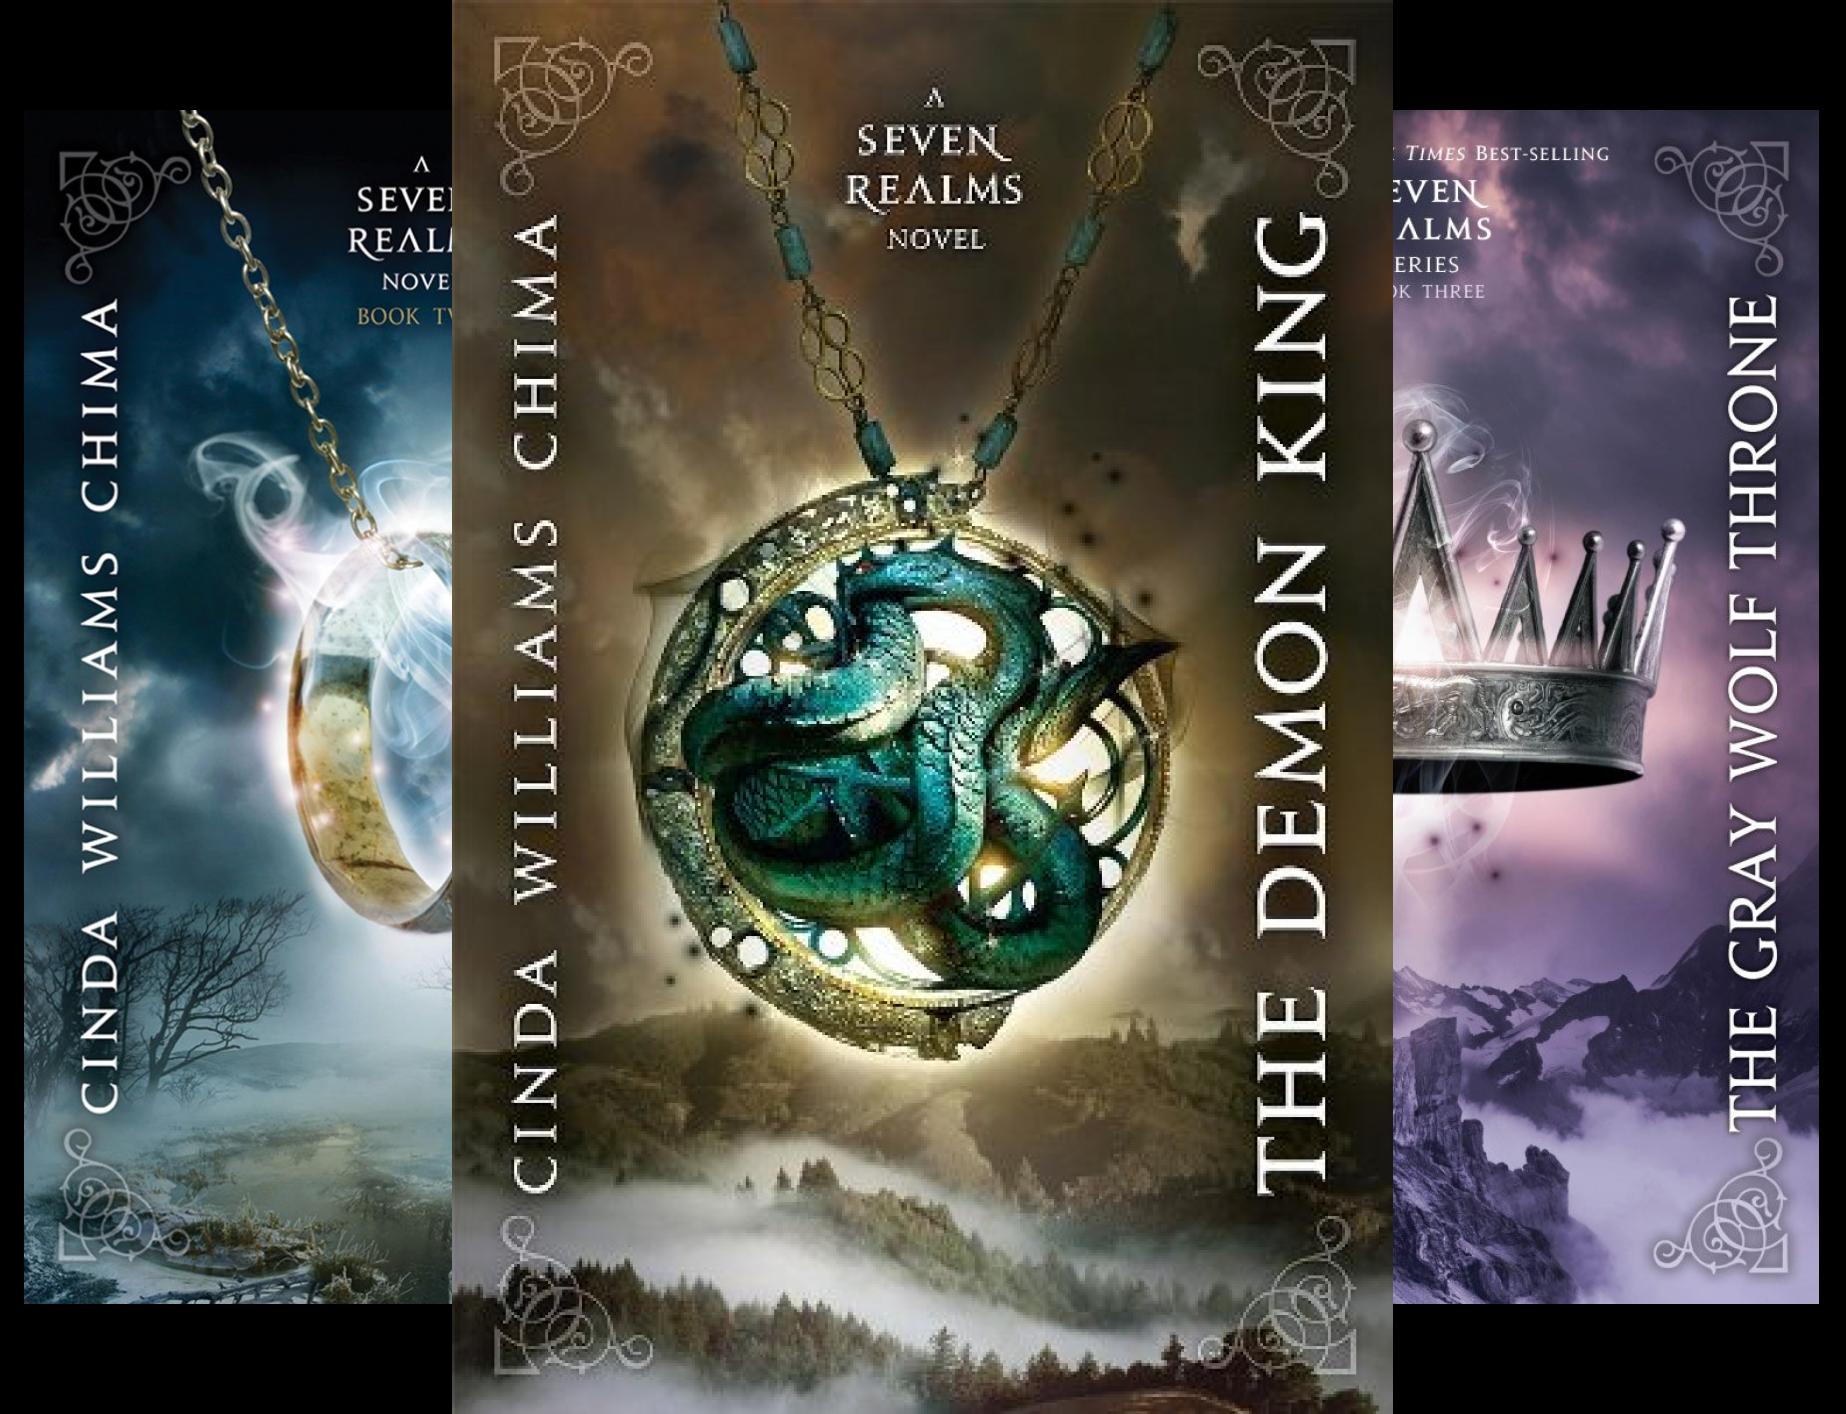 Cinda Williams Chima - Seven Realms (4 Book Series)